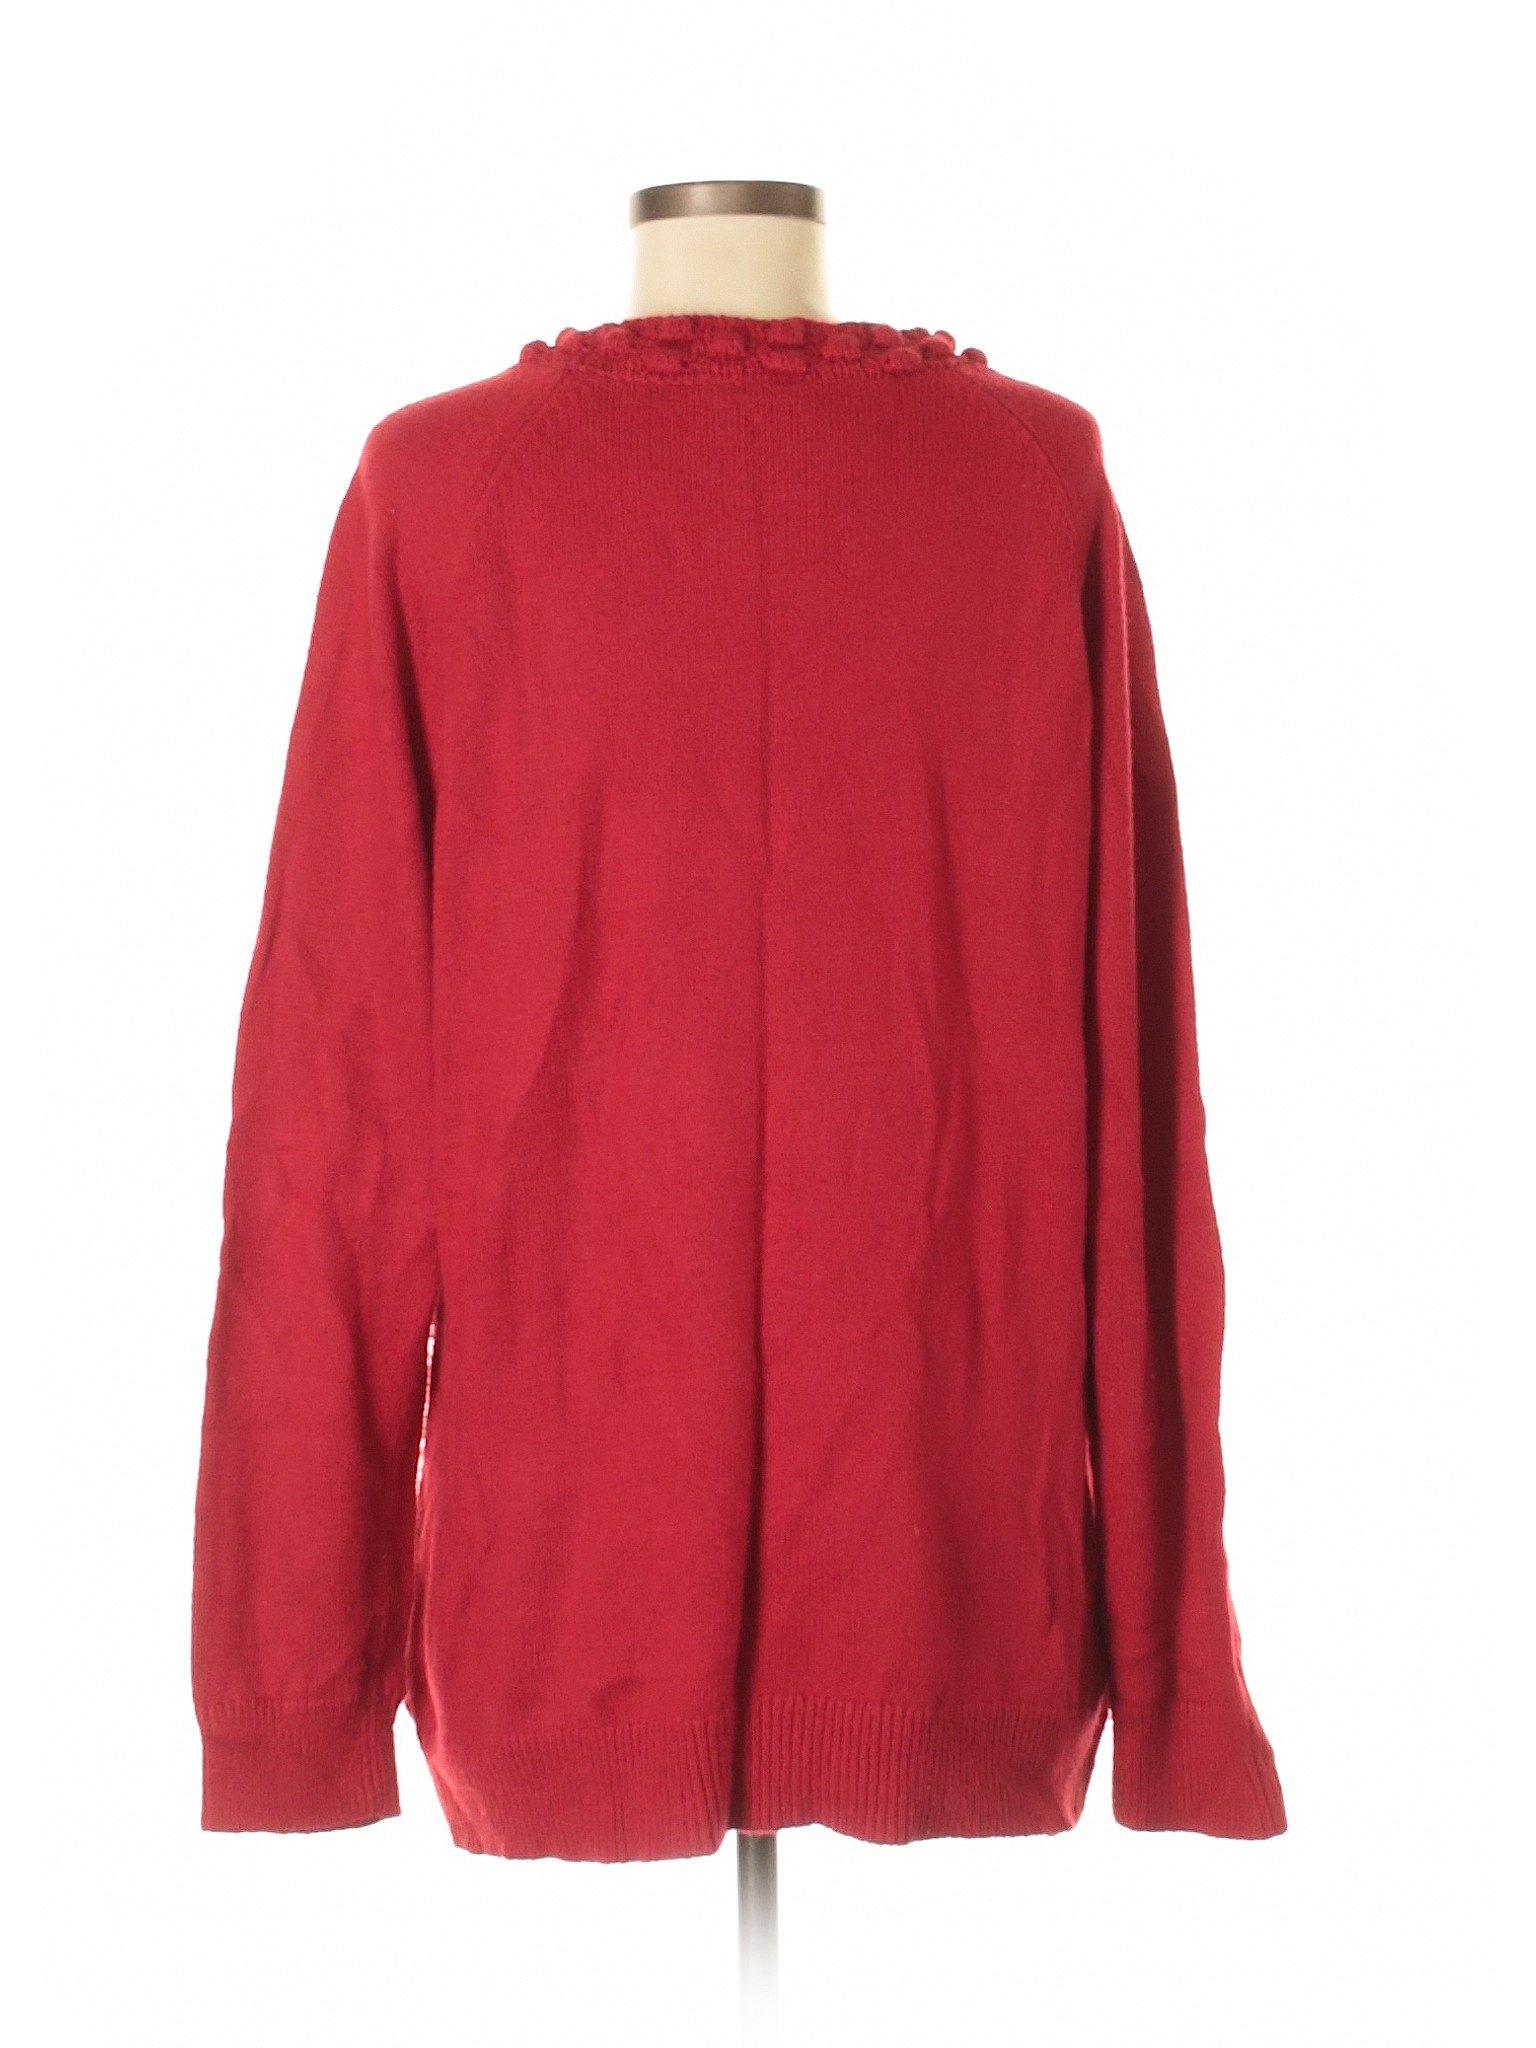 Sweater LOFT Ann Pullover Taylor Boutique Outlet winter AqRg1RzT